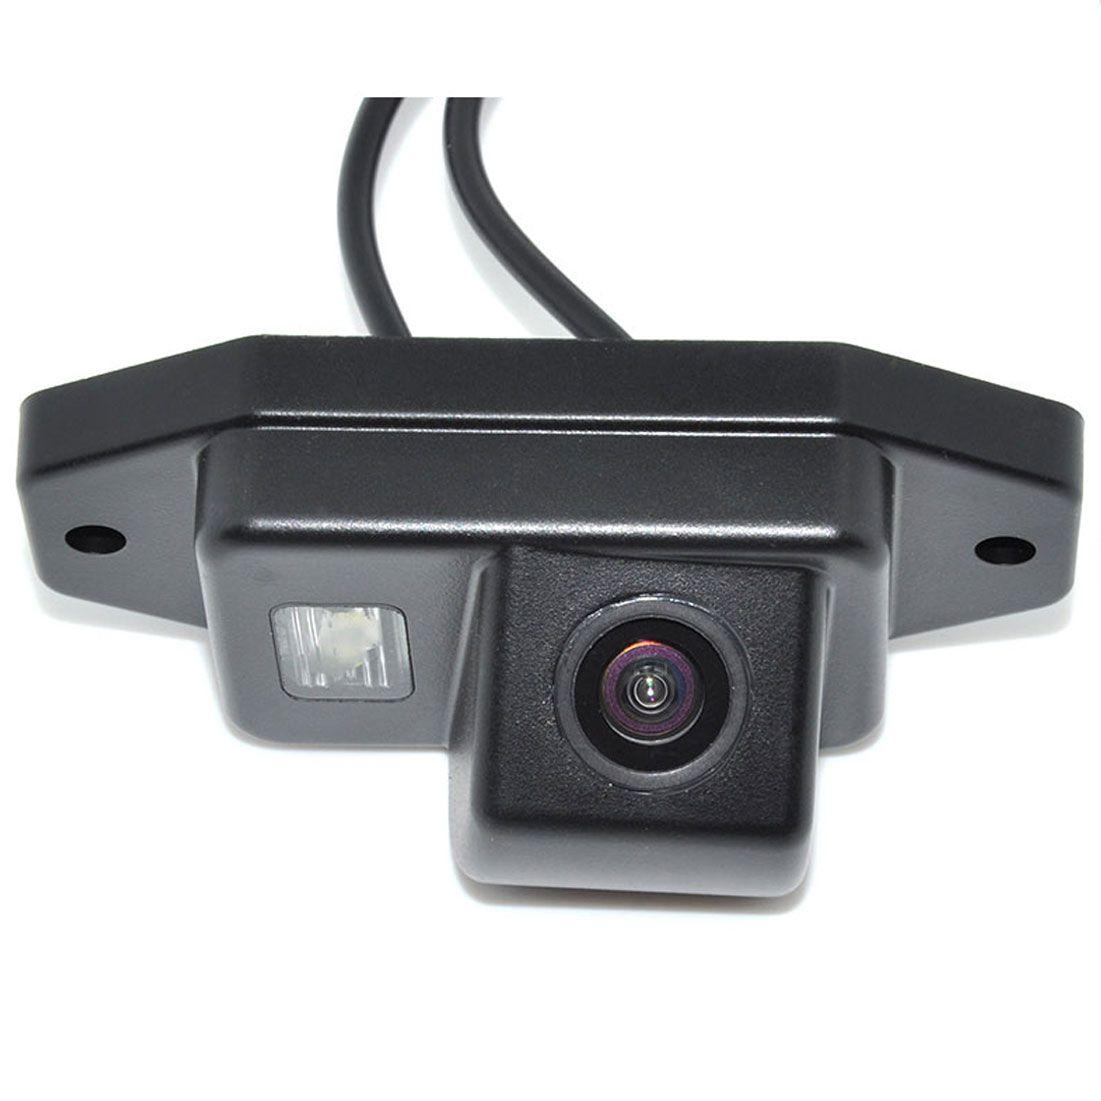 HD CCD Car rear view camera backup camera for 2002-2009 Toyota Land <font><b>Cruiser</b></font> 120 Series Toyota Prado 2700 4000